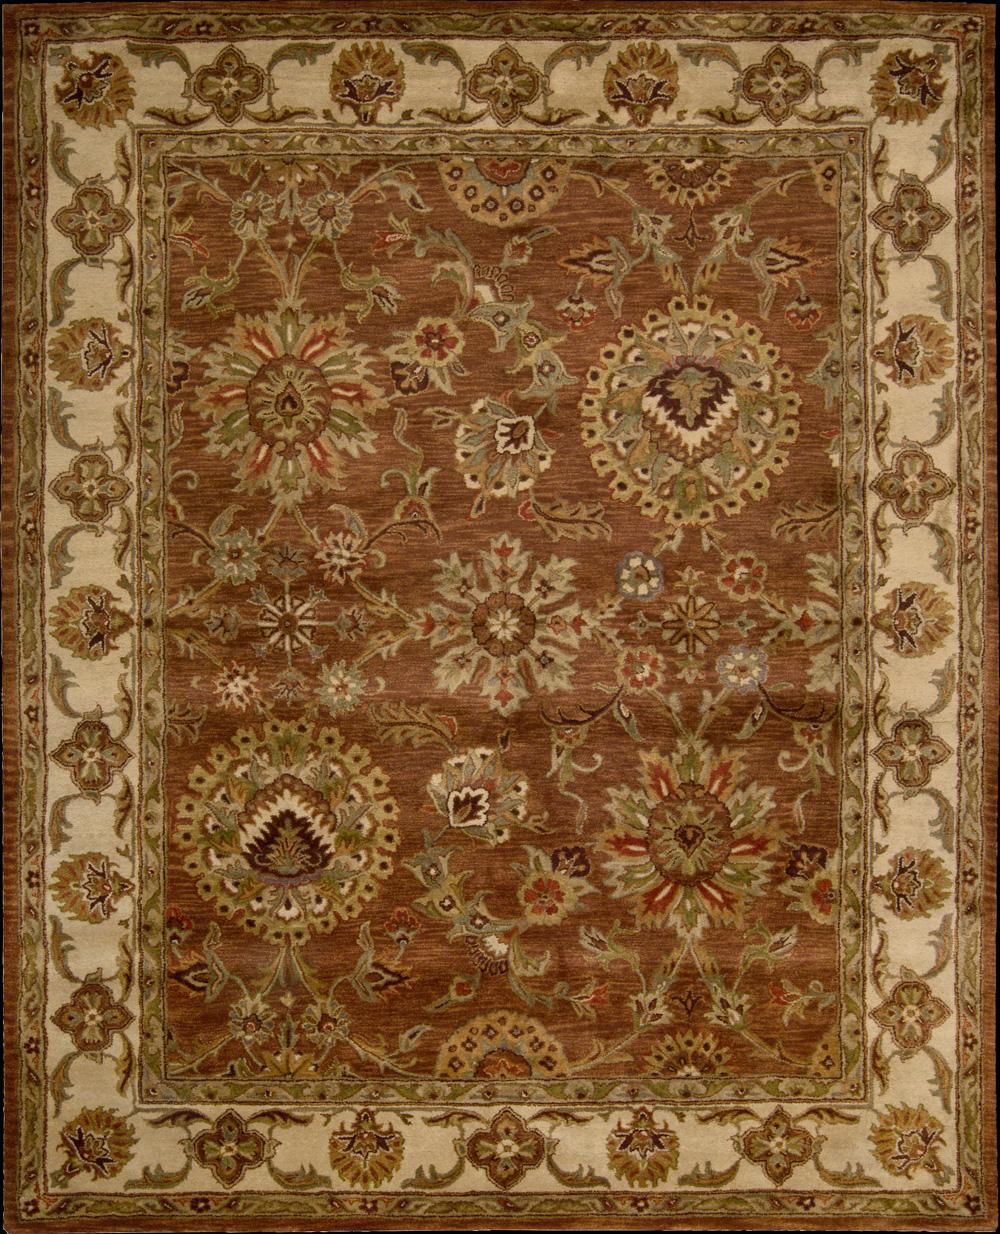 "Nourison Jaipur Area Rug 7'9"" x 9'9"" - Item Number: 77146"